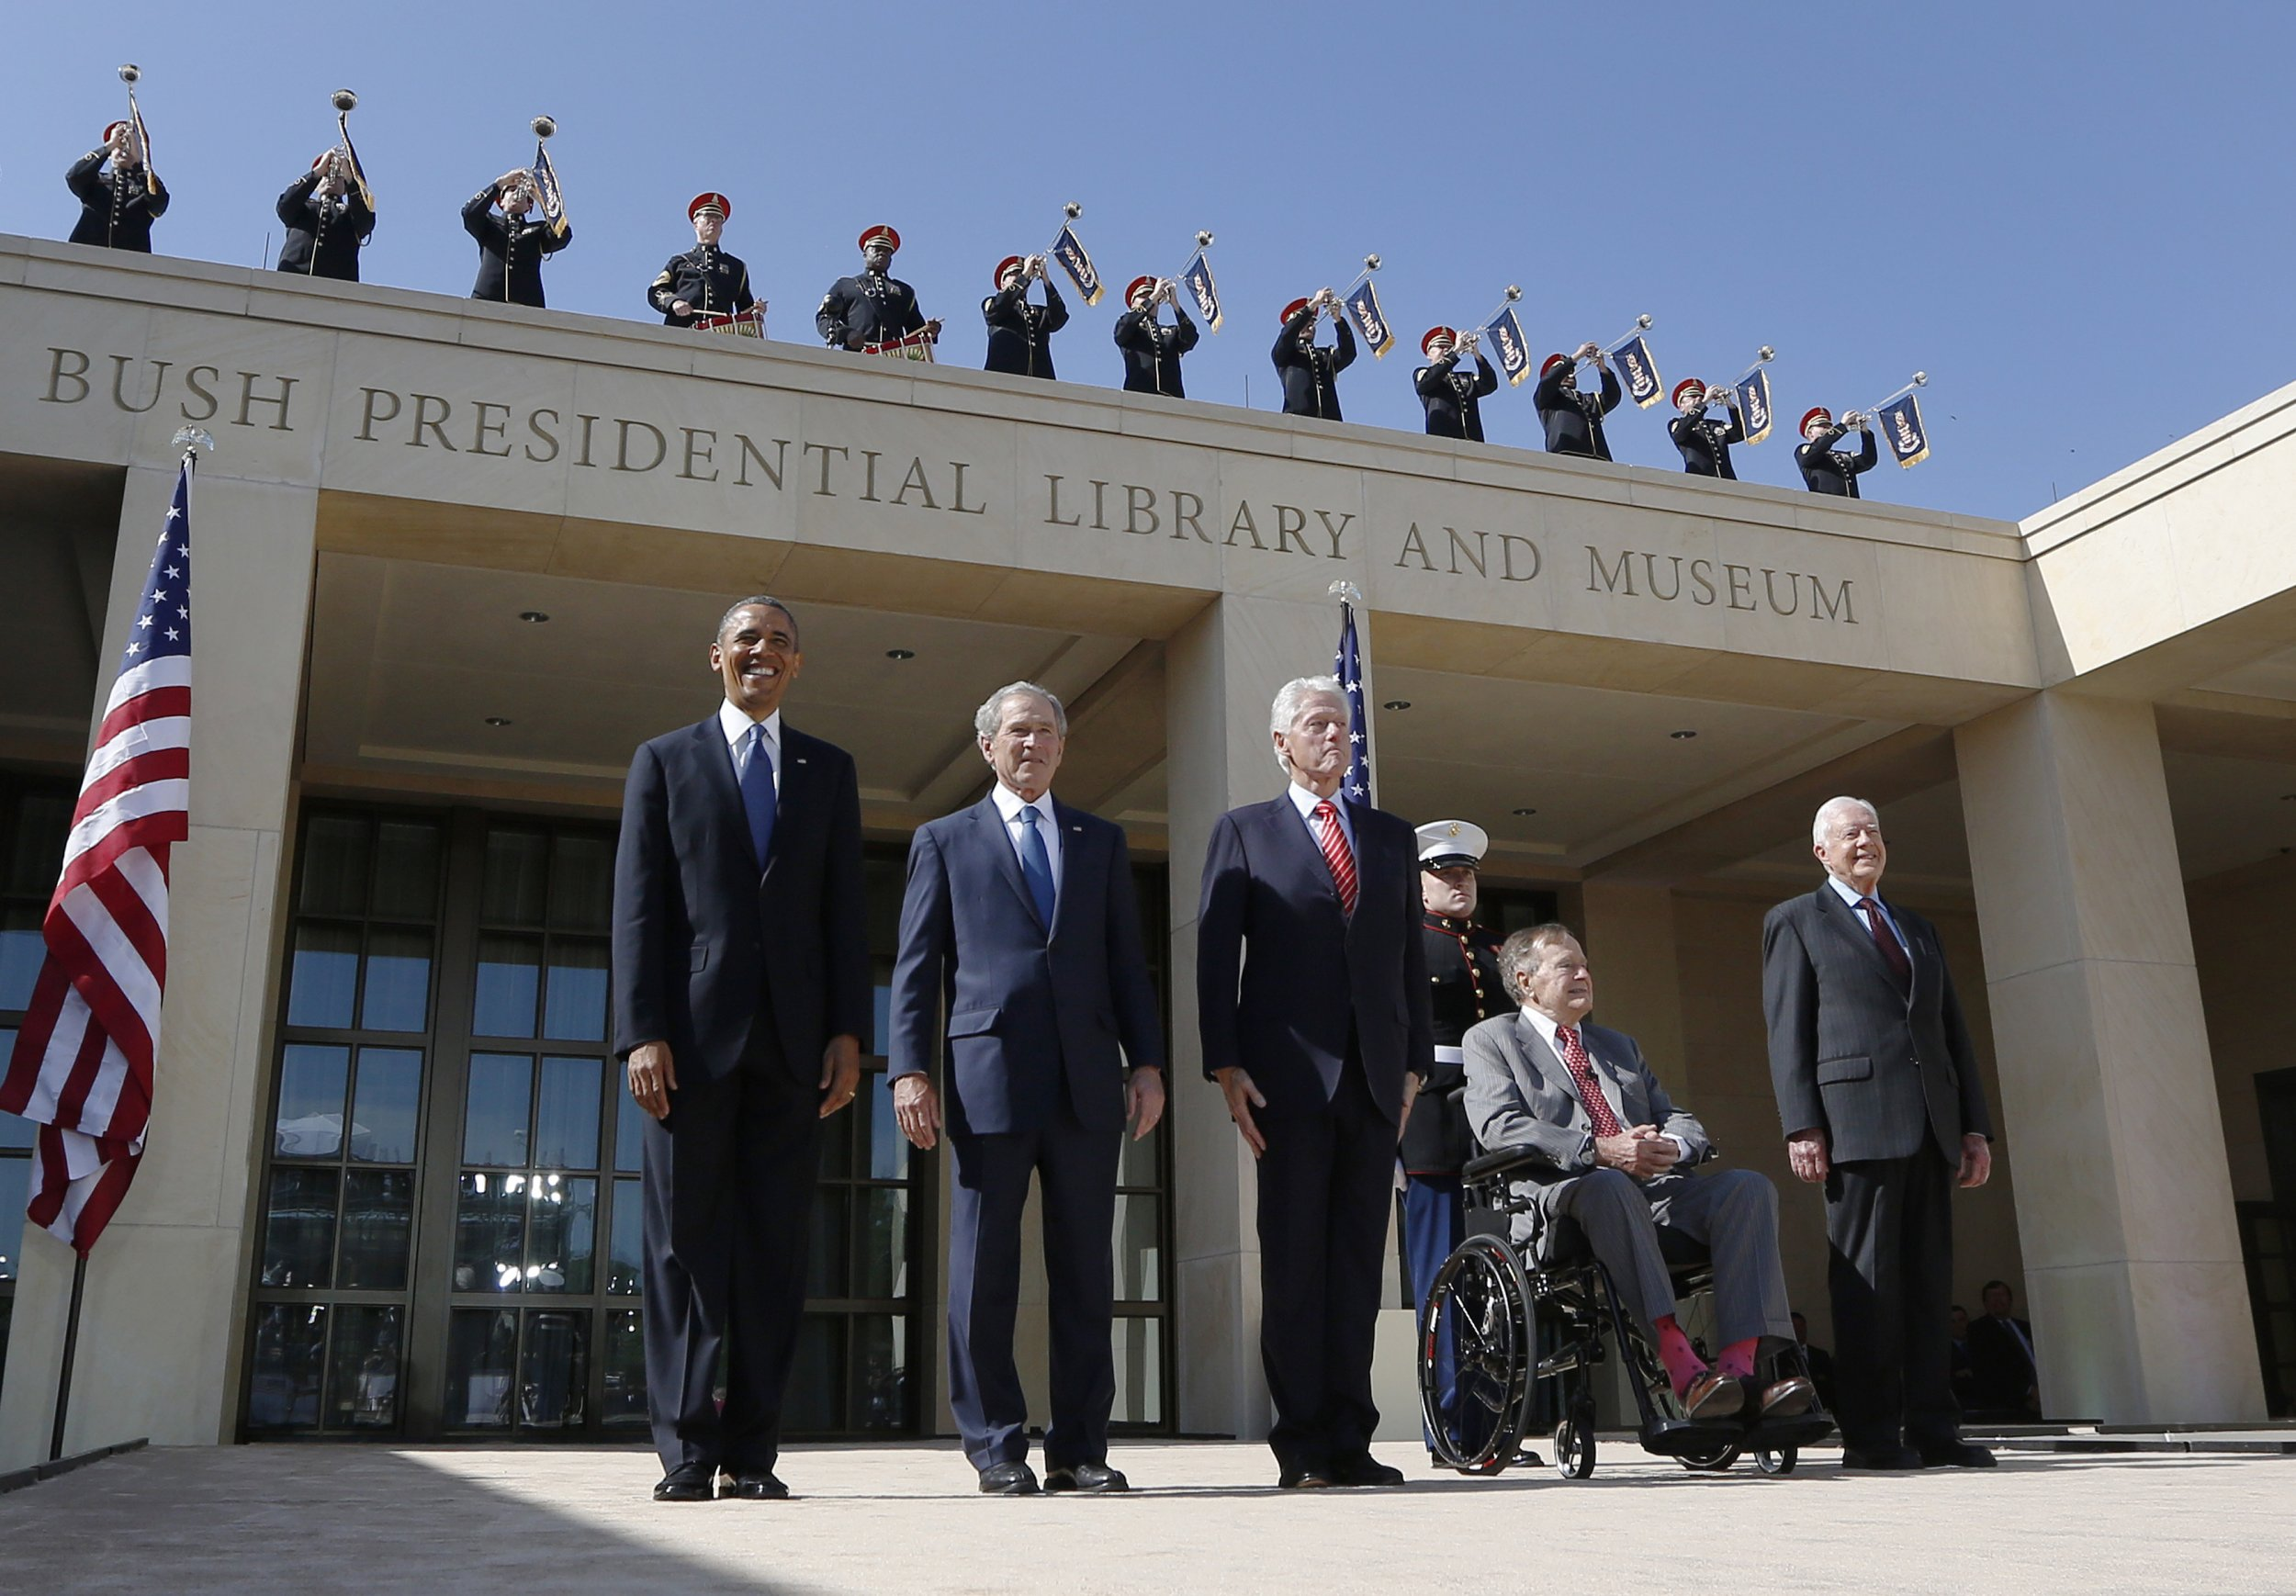 10_06_formerpresidents_bush_obama_clinton_carter